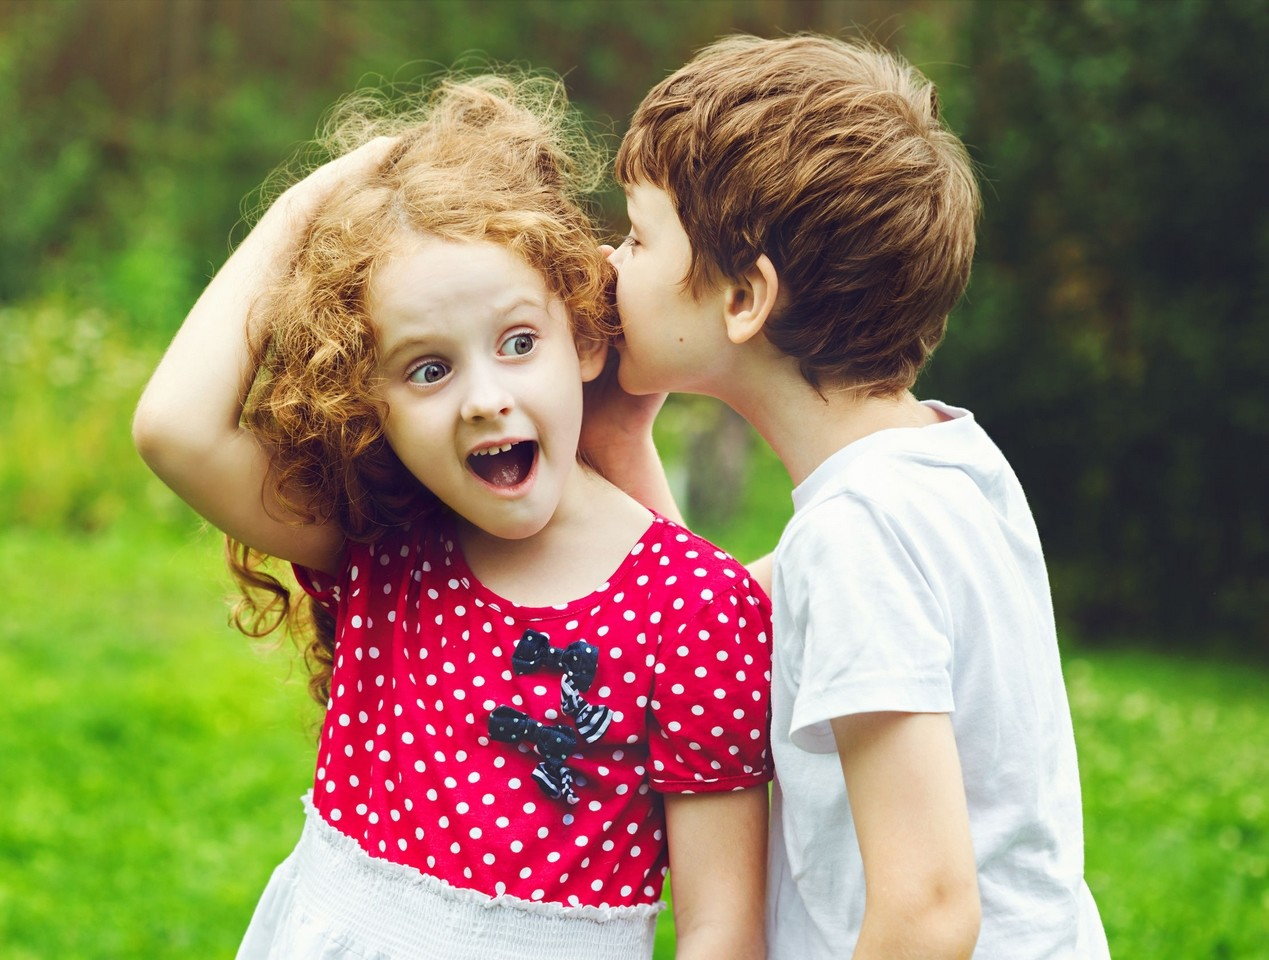 Kinder Geheimnis Tipp ©123RF